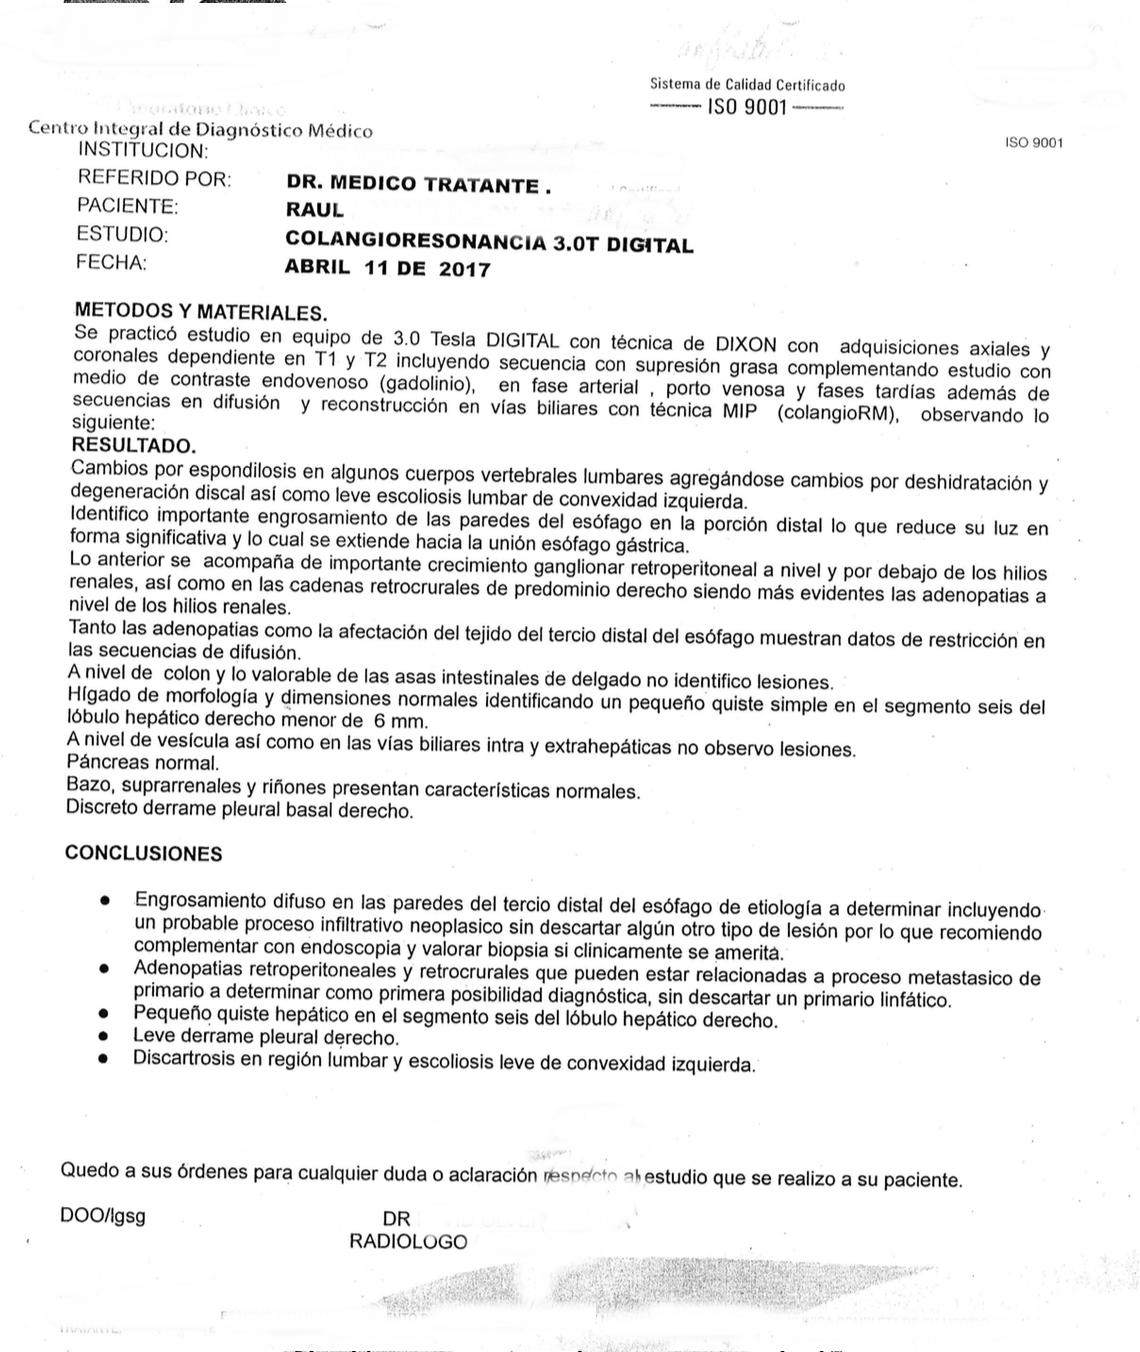 LifEscozul® - Raúl 2 - Cáncer Gástrico Intestinal